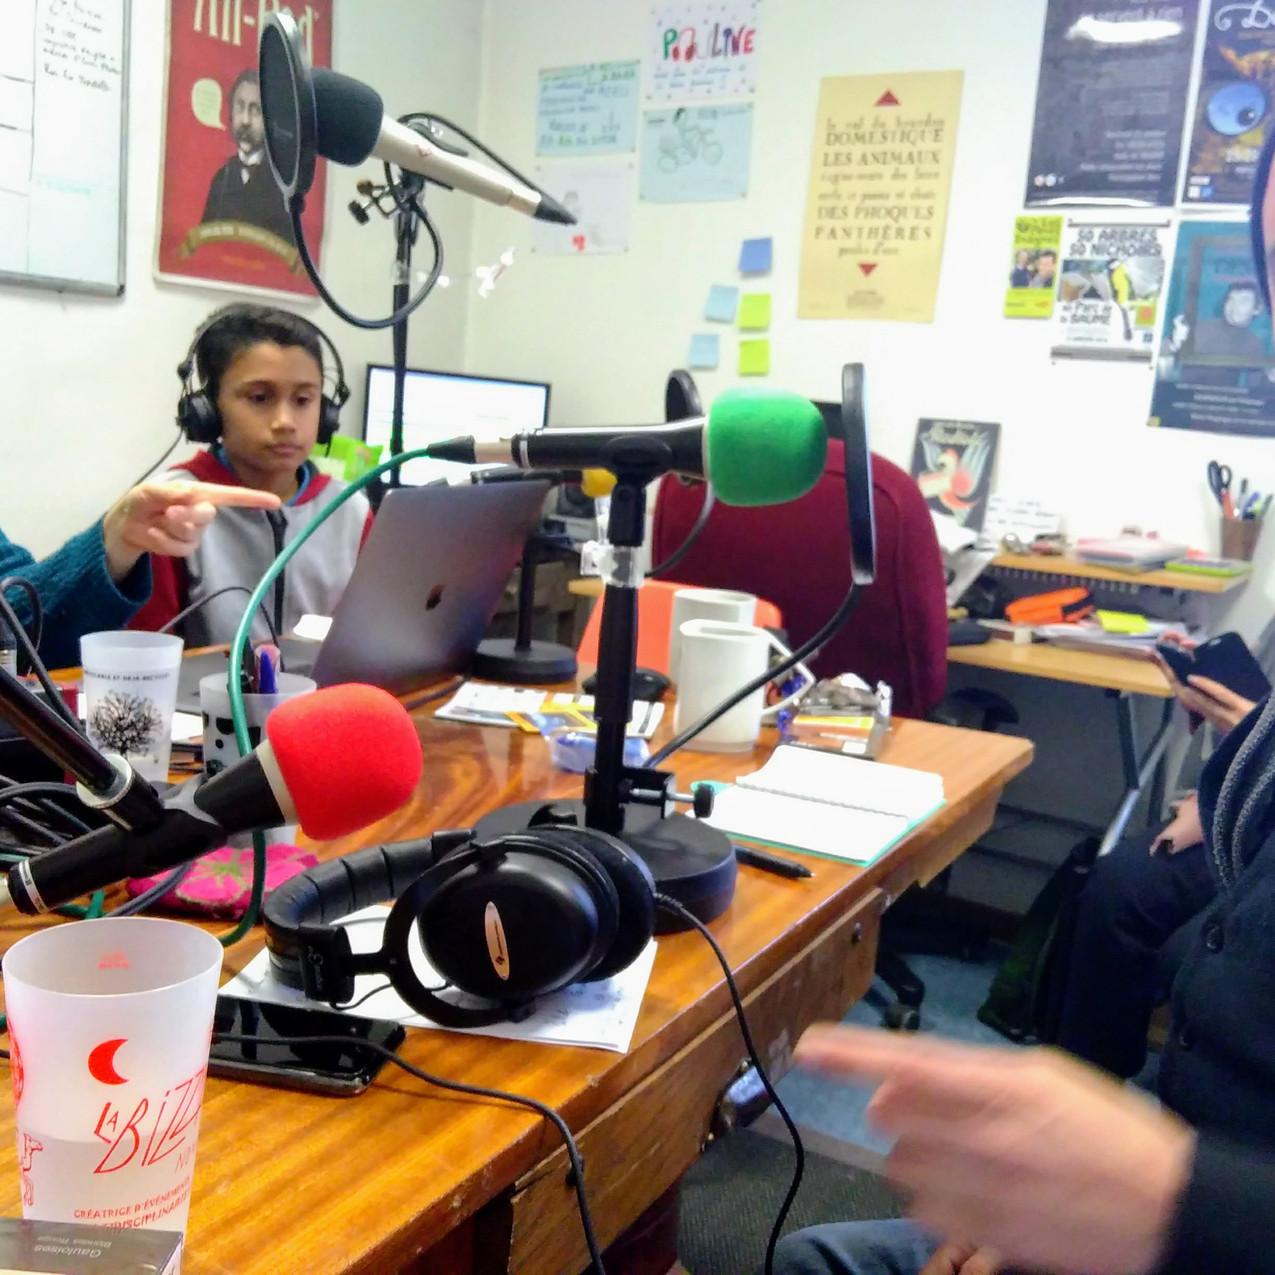 Clarence en visite à RadioLà